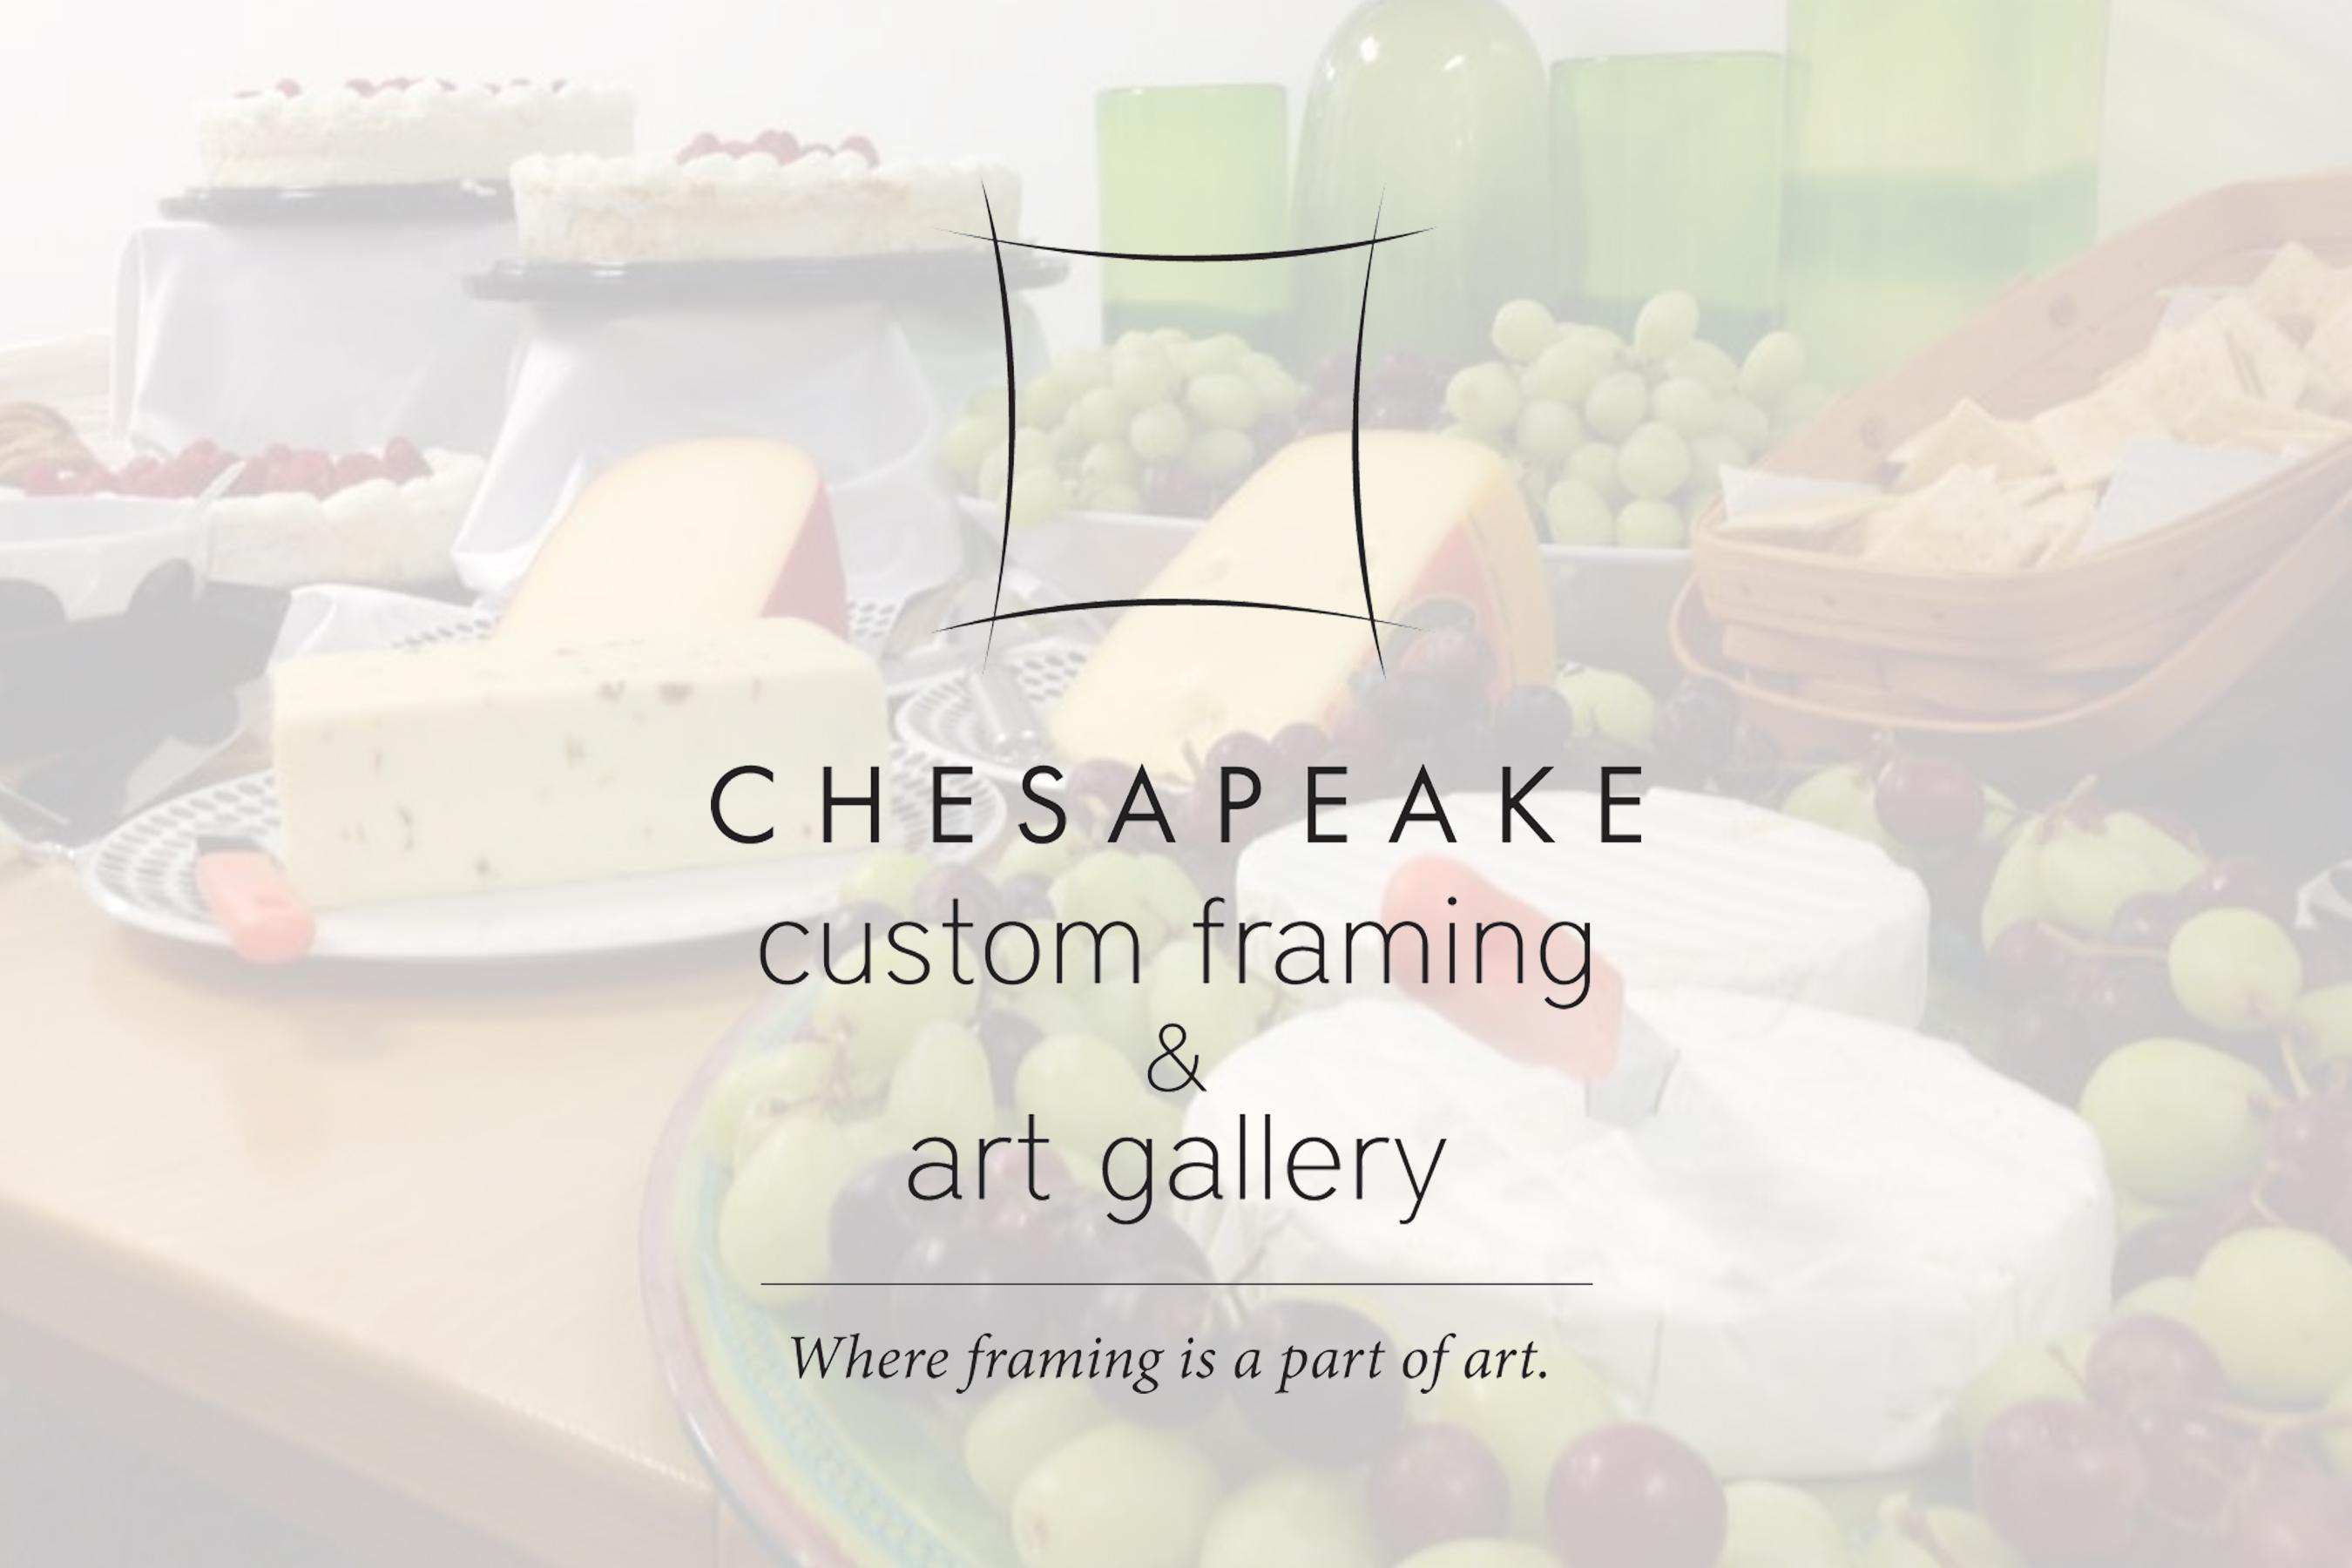 Chesapeake Framing   Artists and Makers Studios